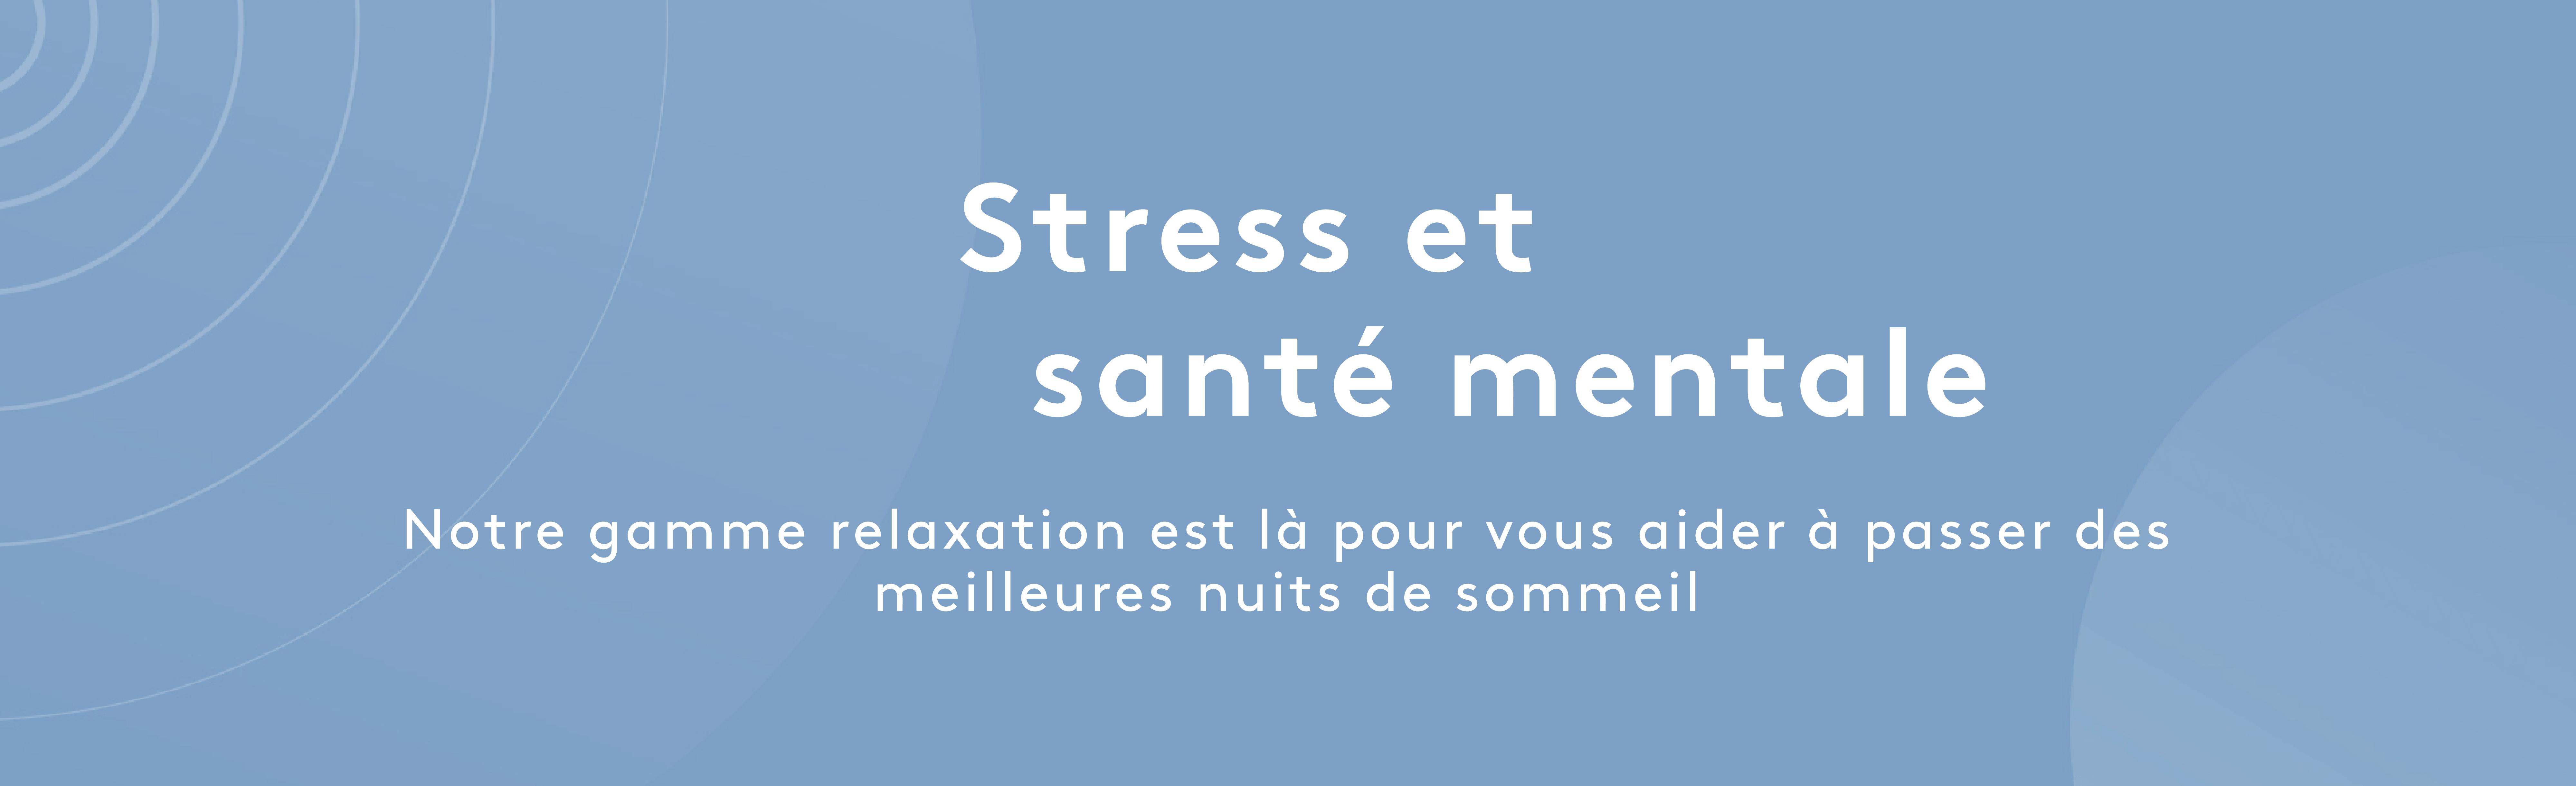 Stress mentale | Myvitamins